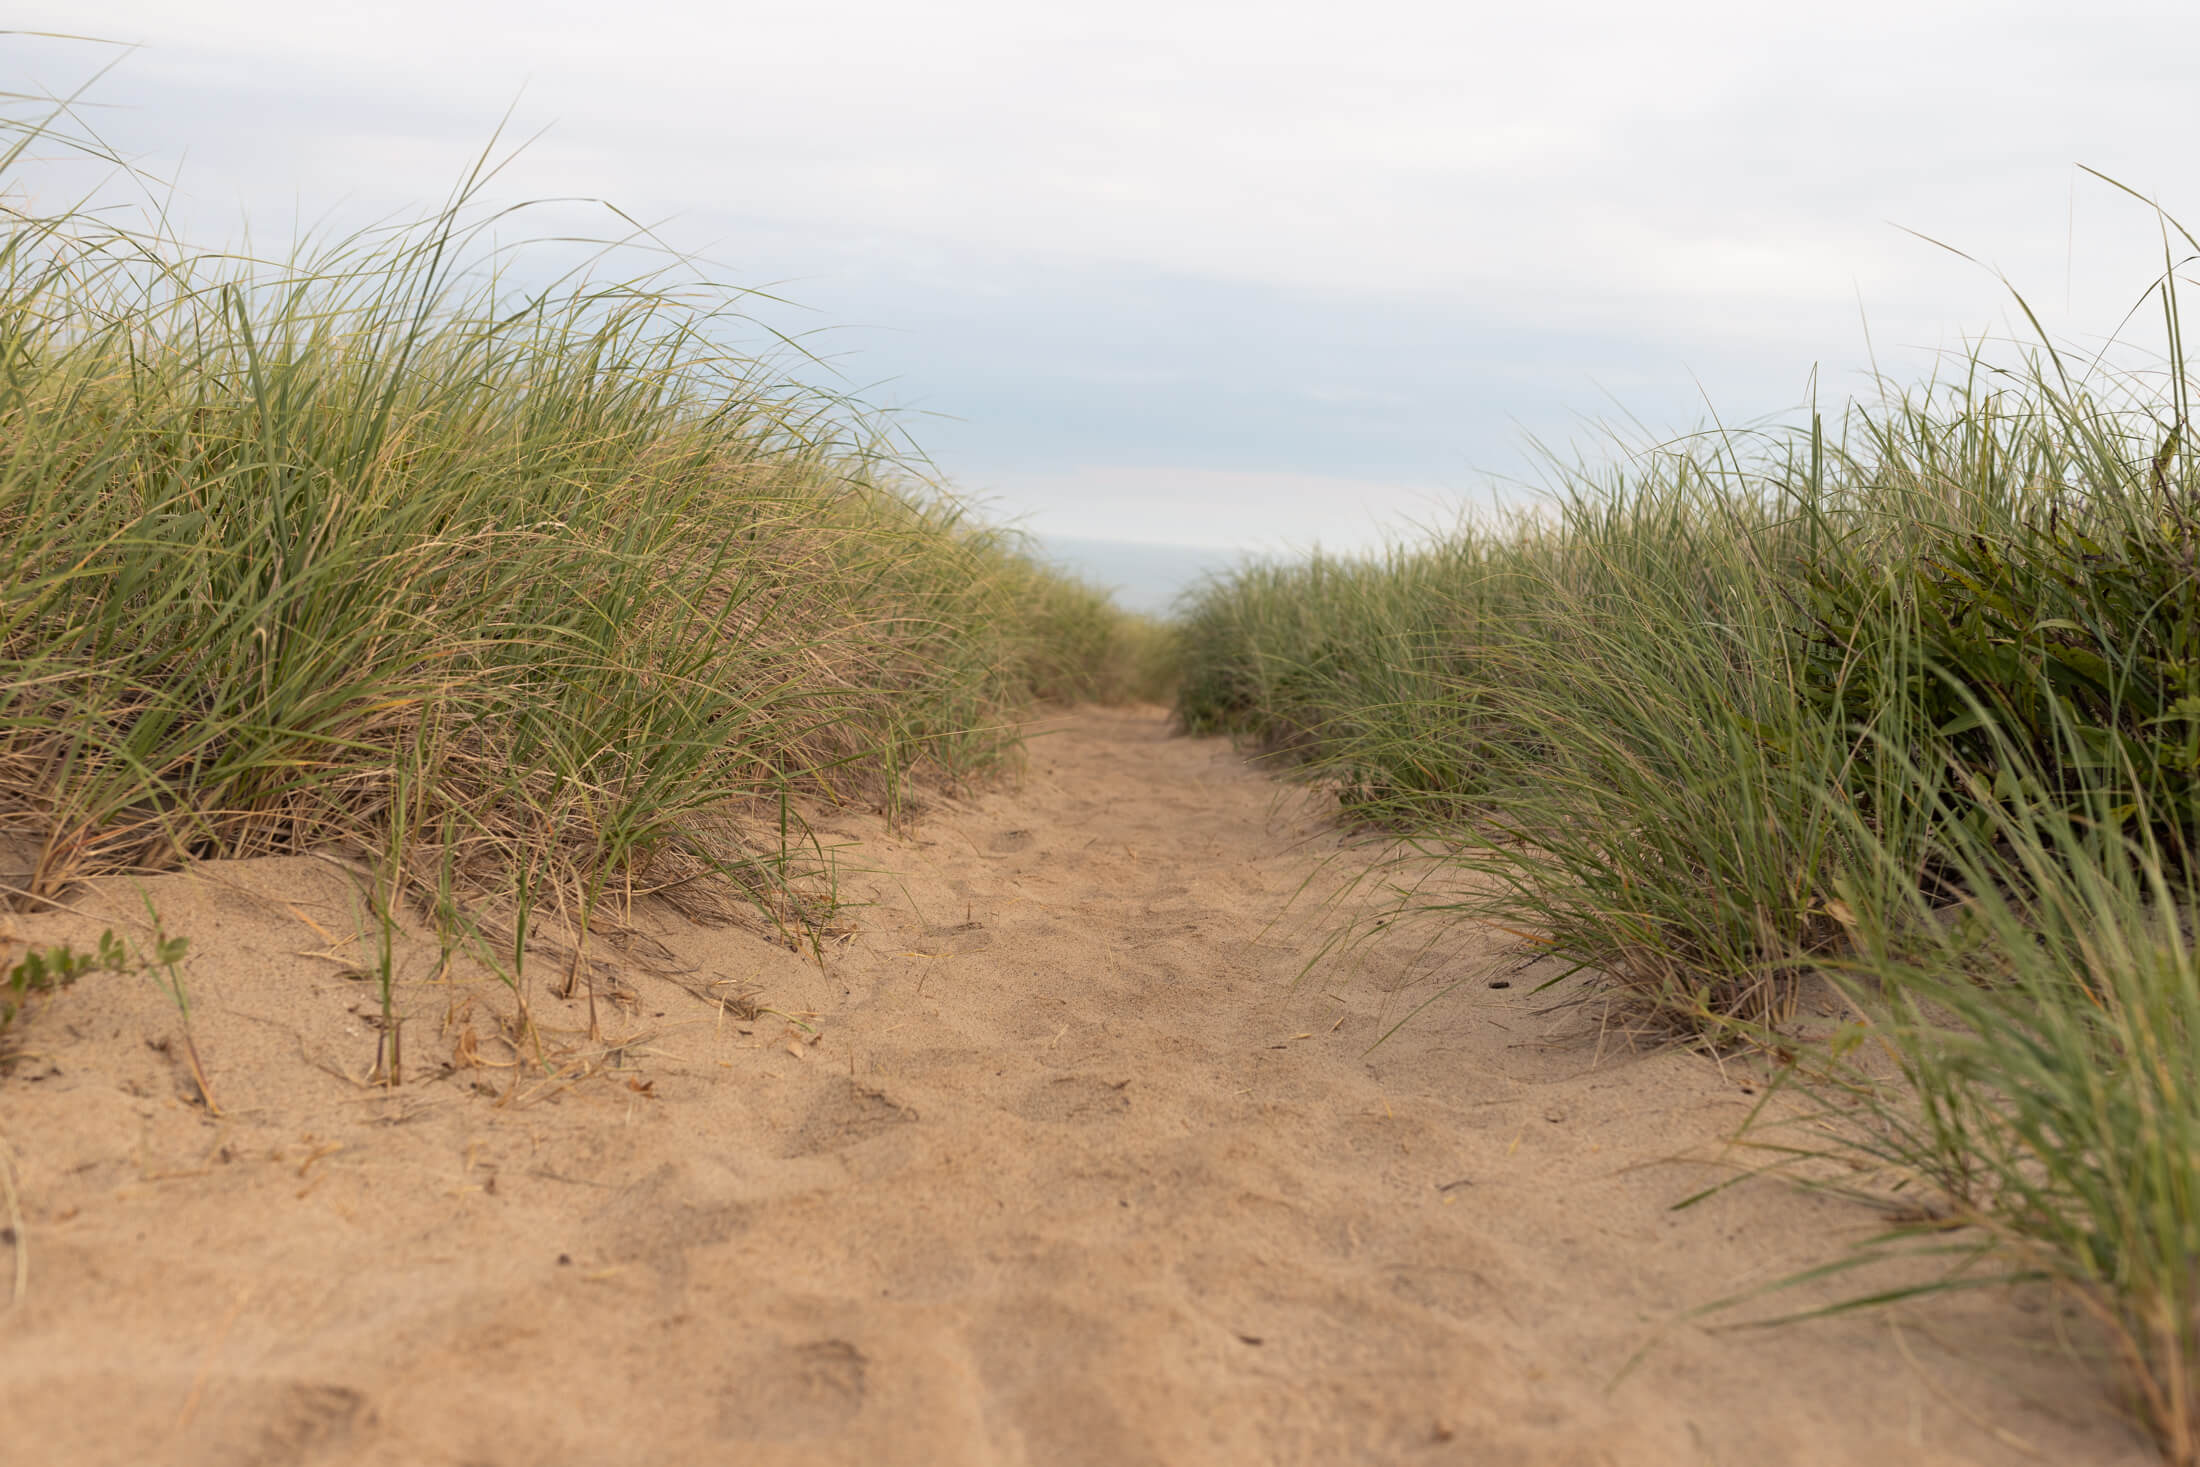 Sandy beach in Cape Cod, Massachusetts, USA.